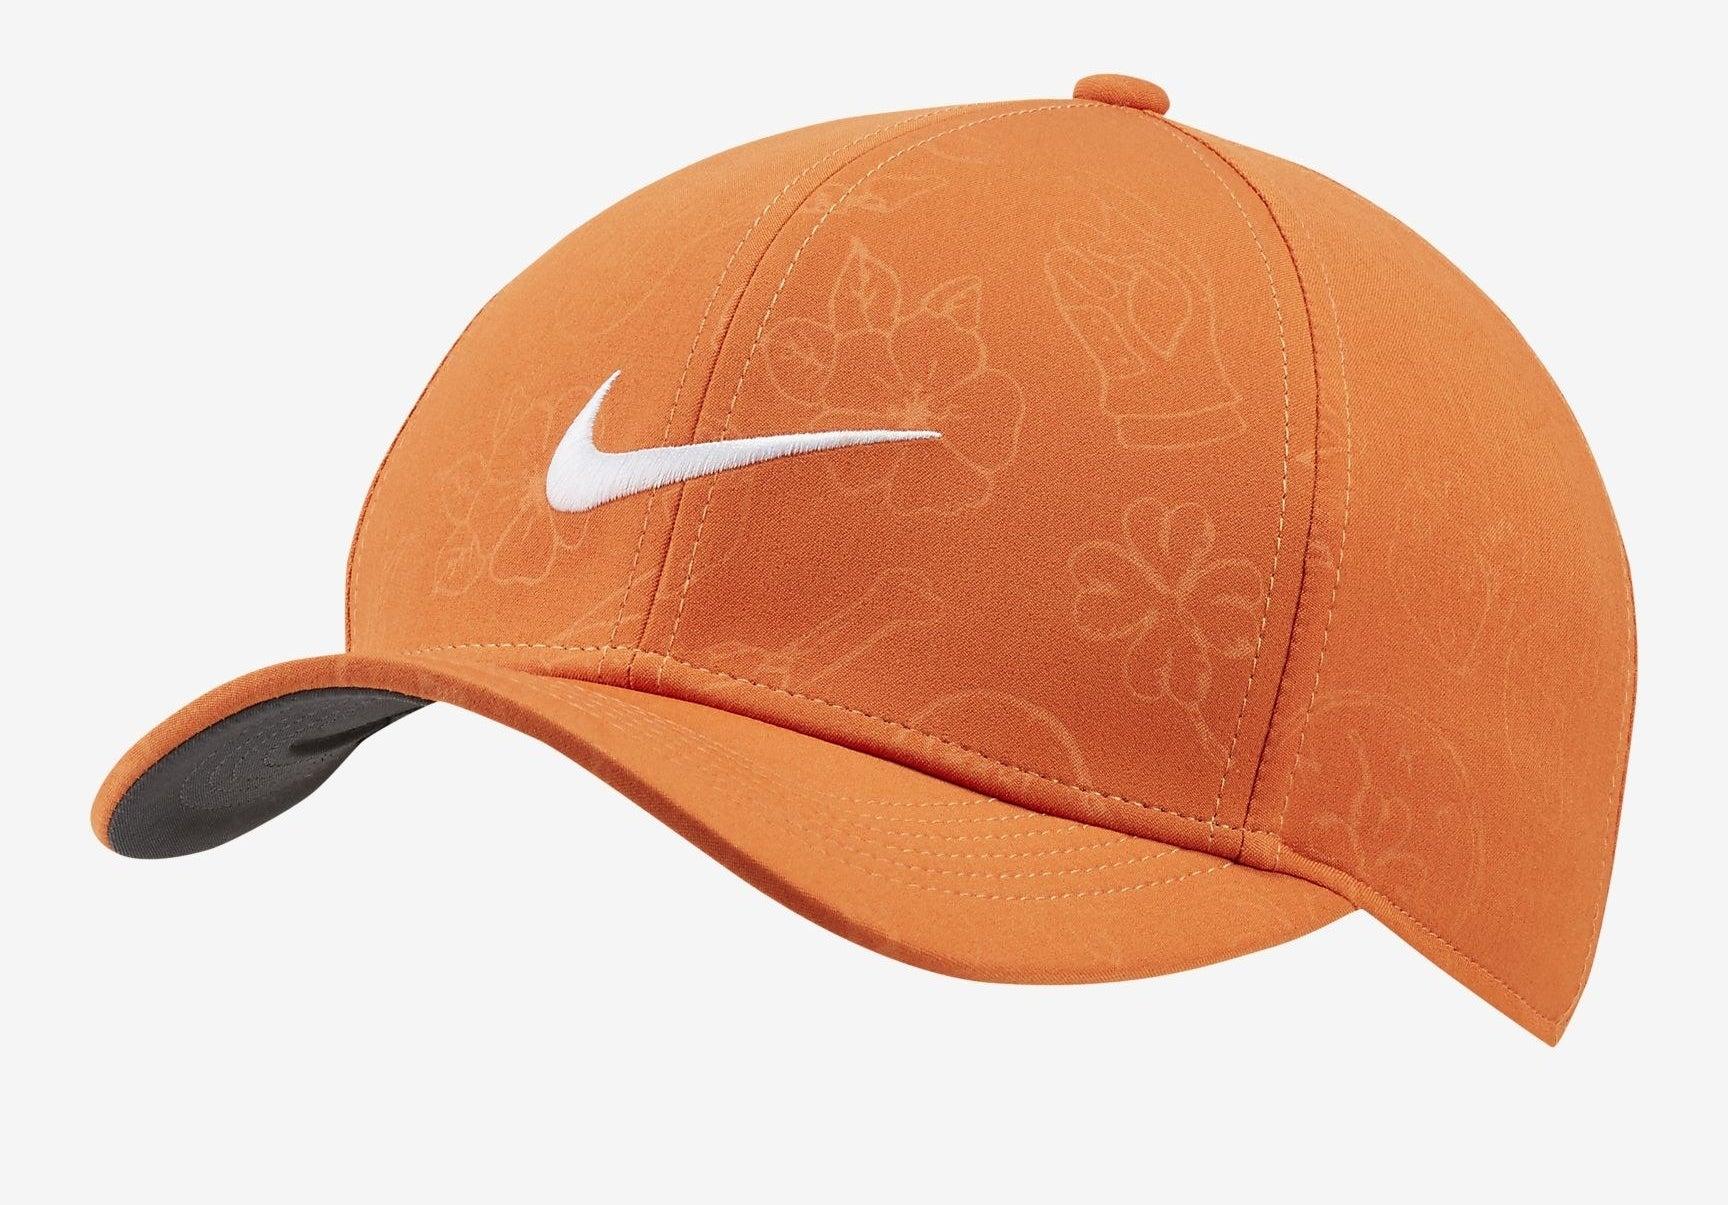 the orange tropical print hat